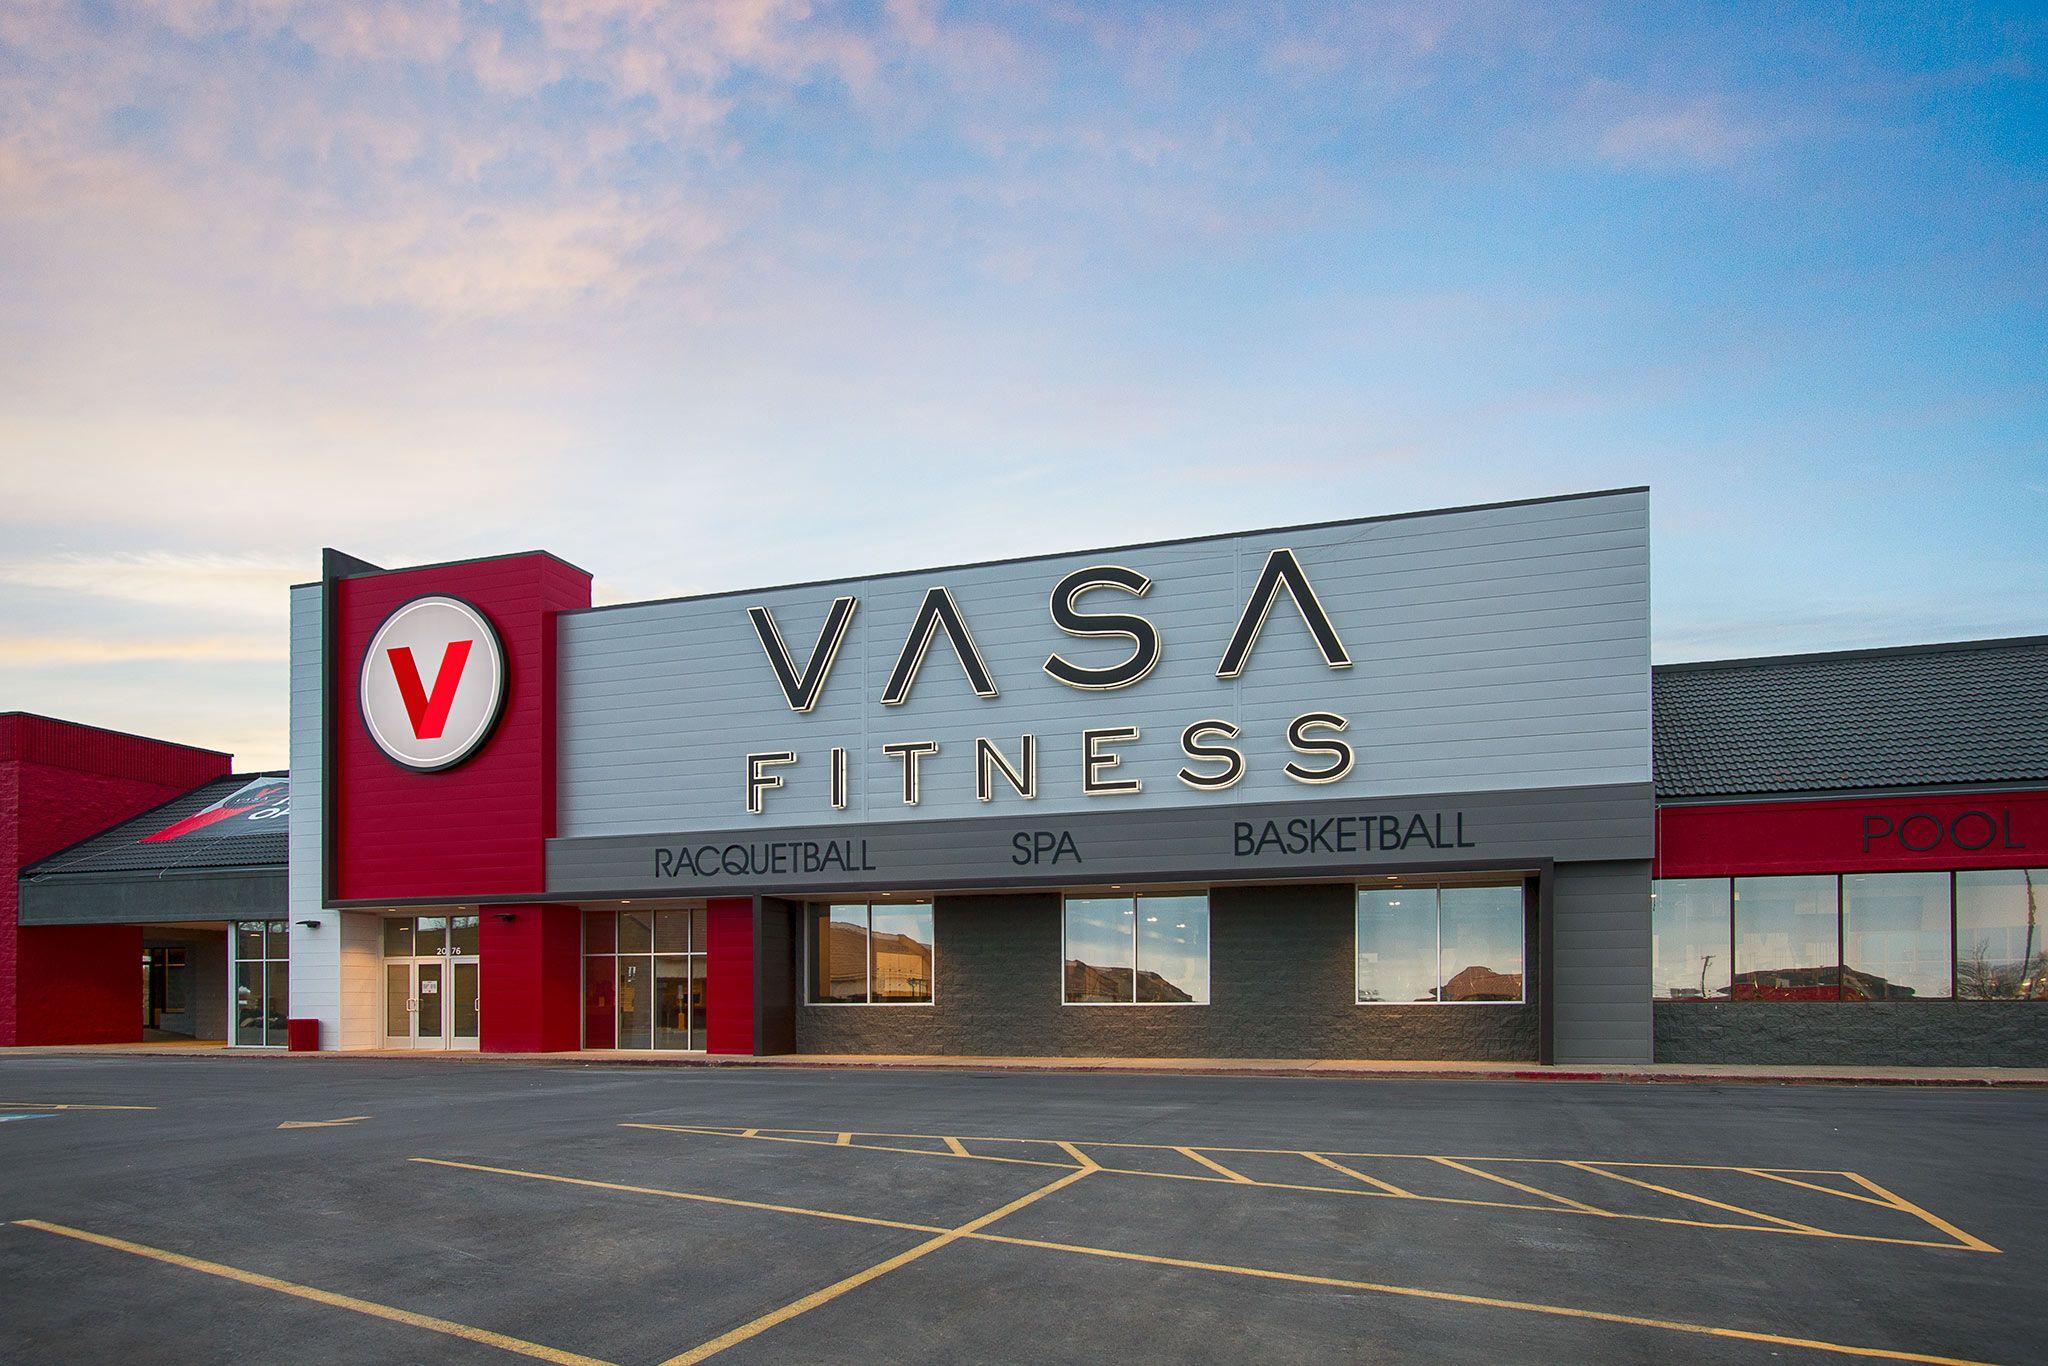 Vasa Fitness Prices Vasa Fitness Price List Guide Wellness Coach Gym Membership Corporate Wellness